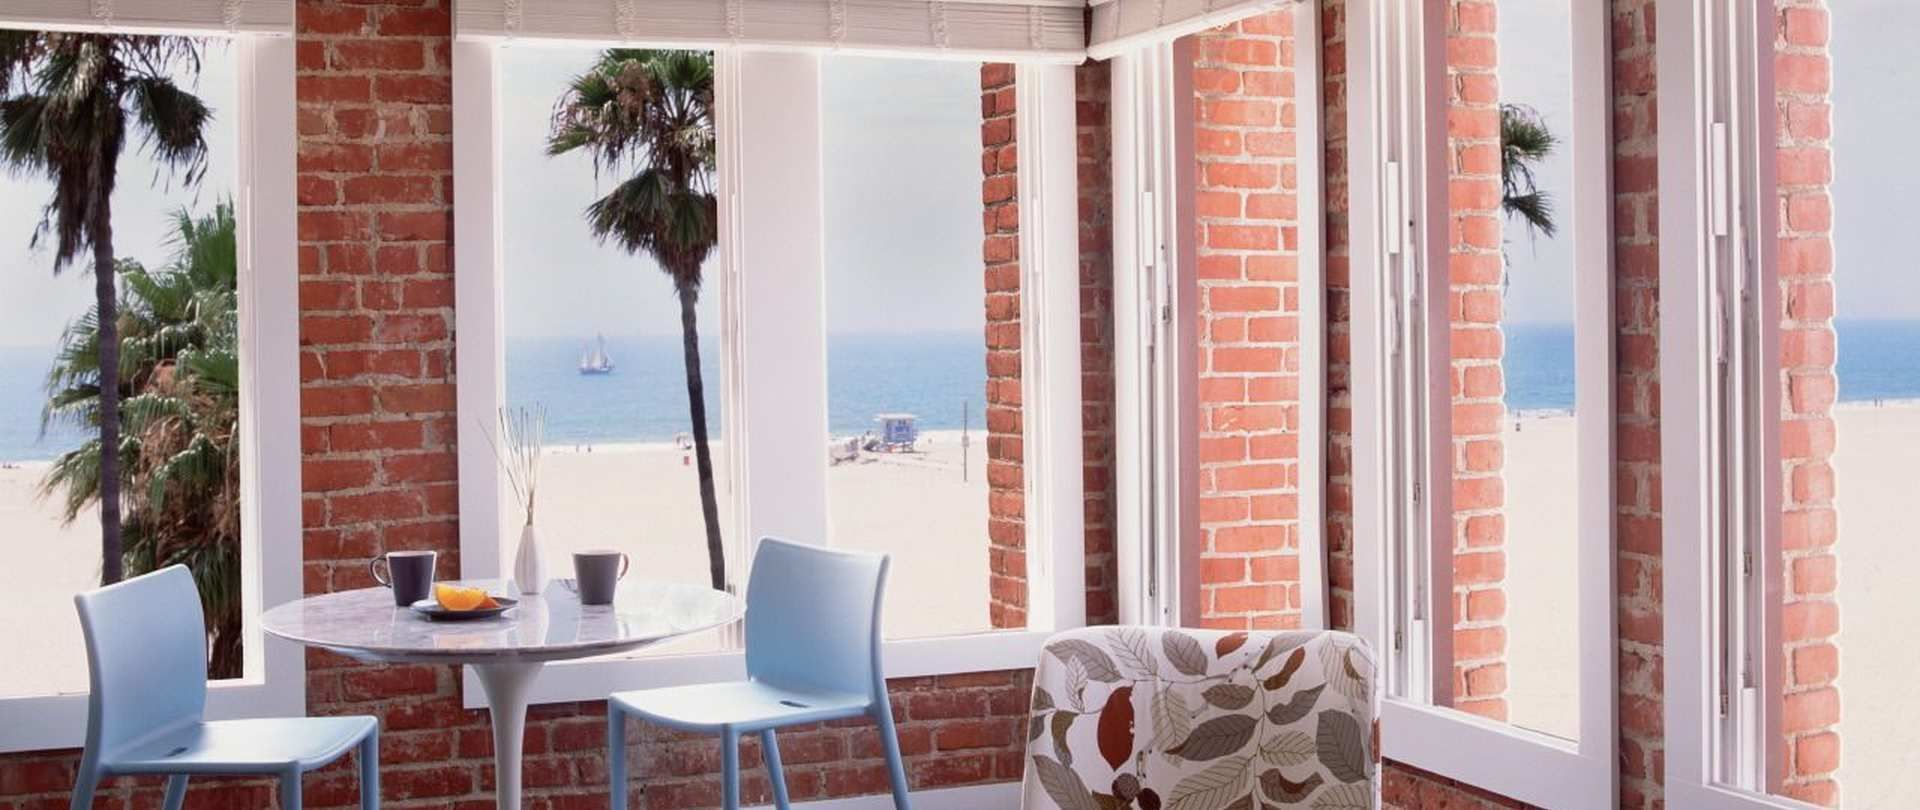 View Our Site    +1 310-566-2222   manager@venicebreezesuites.com  2 Breeze Avenue Venice Beach, Los Angeles, CA 90291